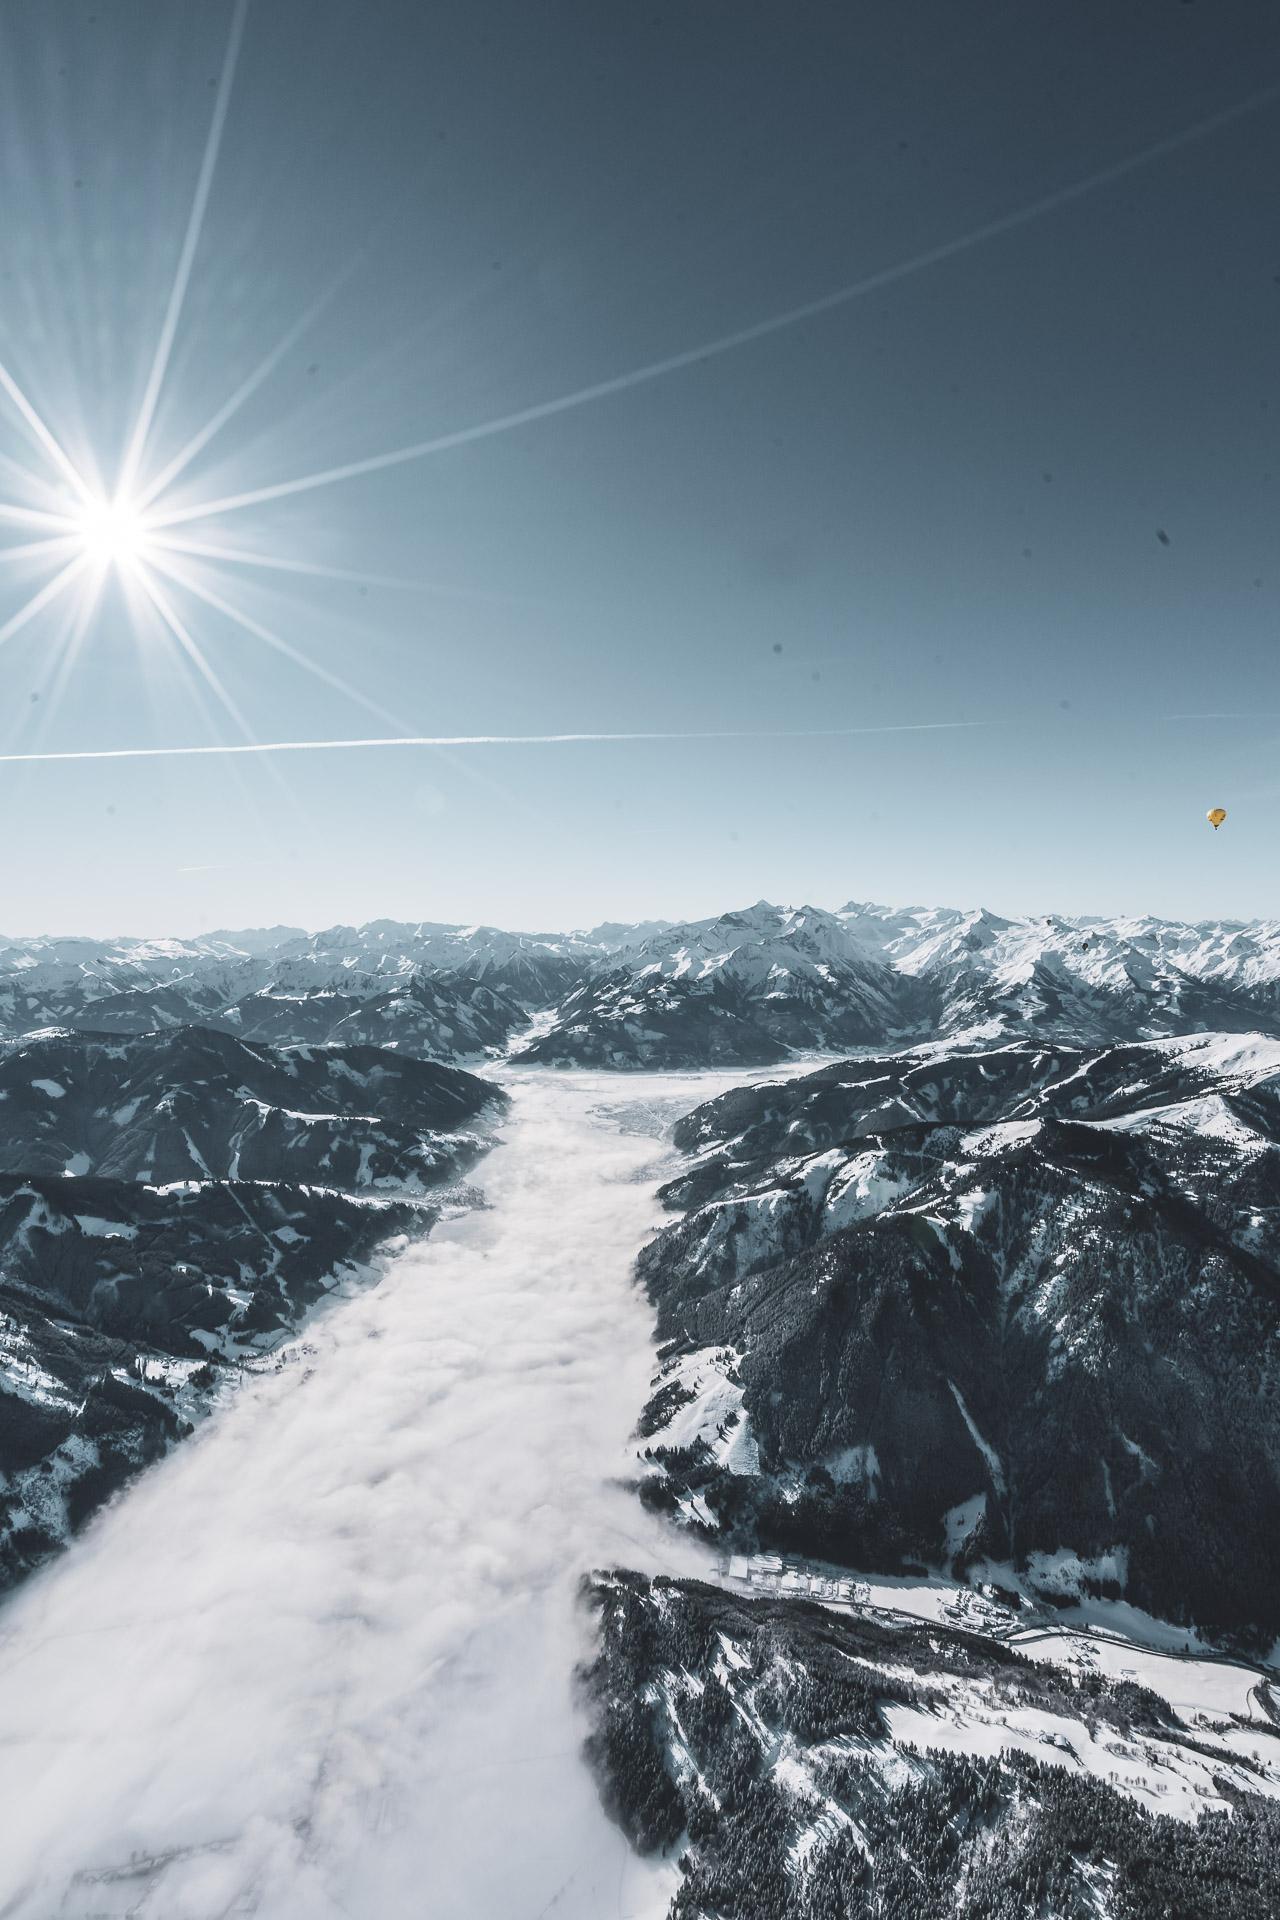 Panoramablick über die Winterlandschaft